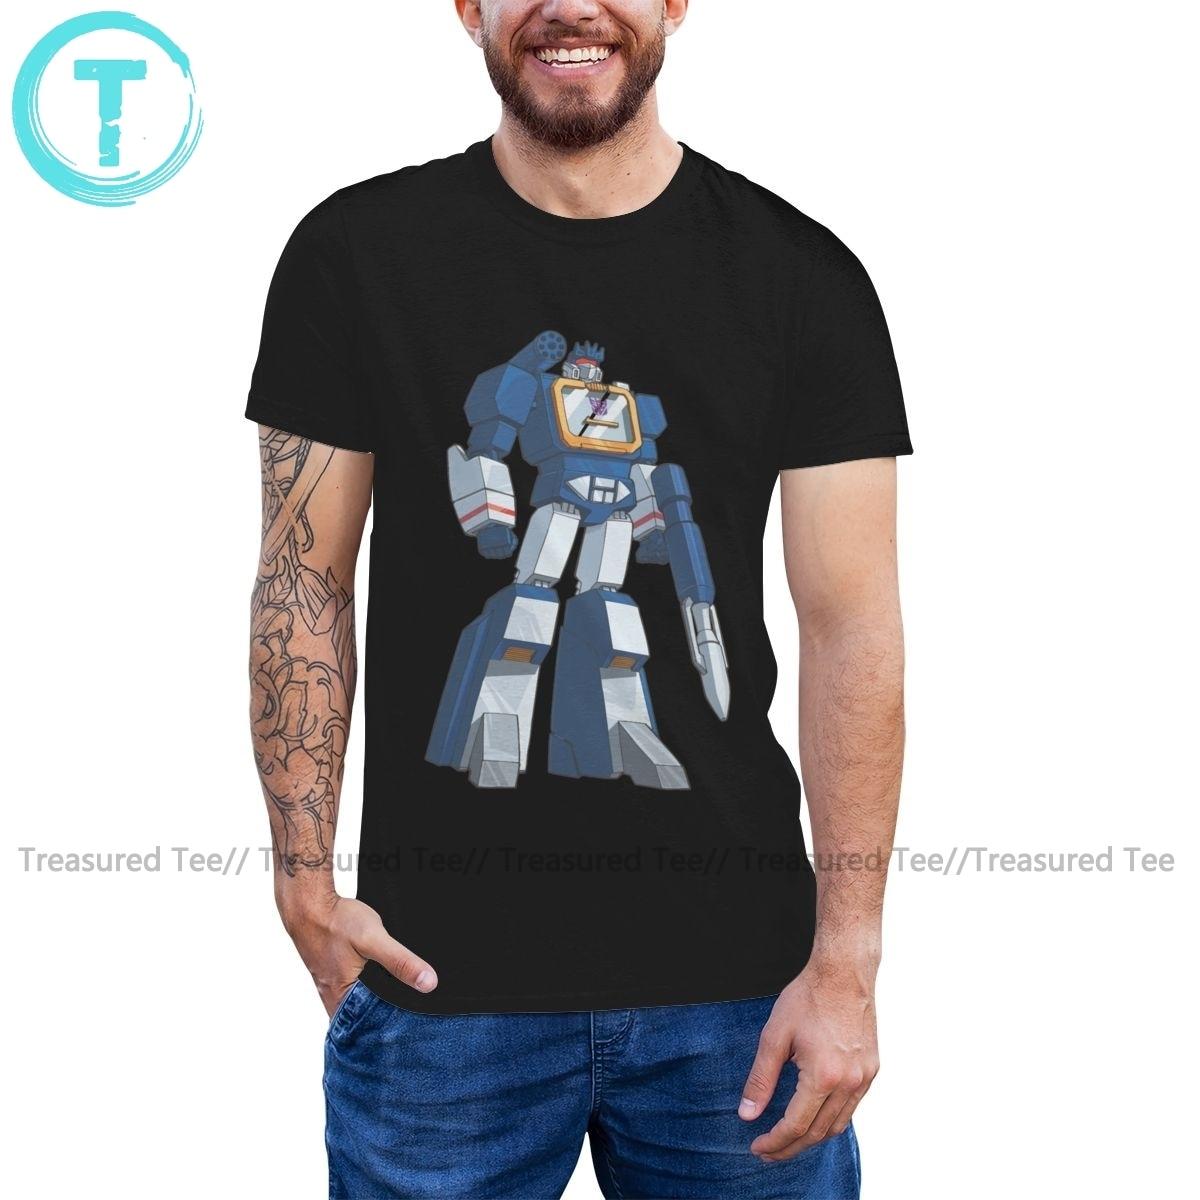 Camiseta Transformer Soundwave, Camiseta de algodón para hombre, camiseta estampada a la moda, divertida camiseta de gran tamaño